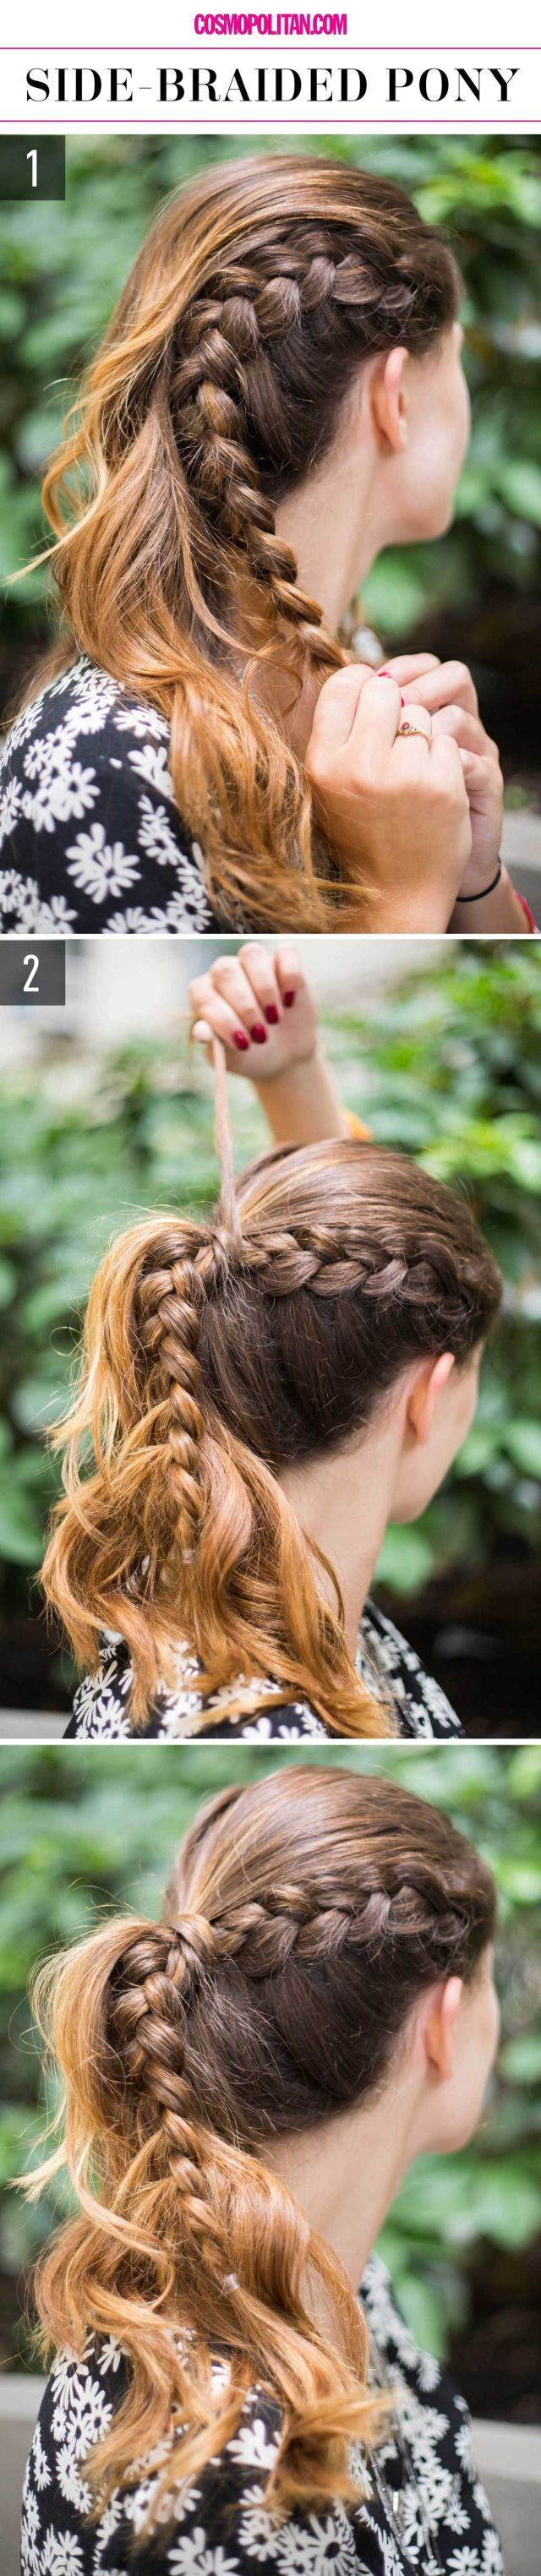 682 best Hairstyles Tutorials DIY images on Pinterest